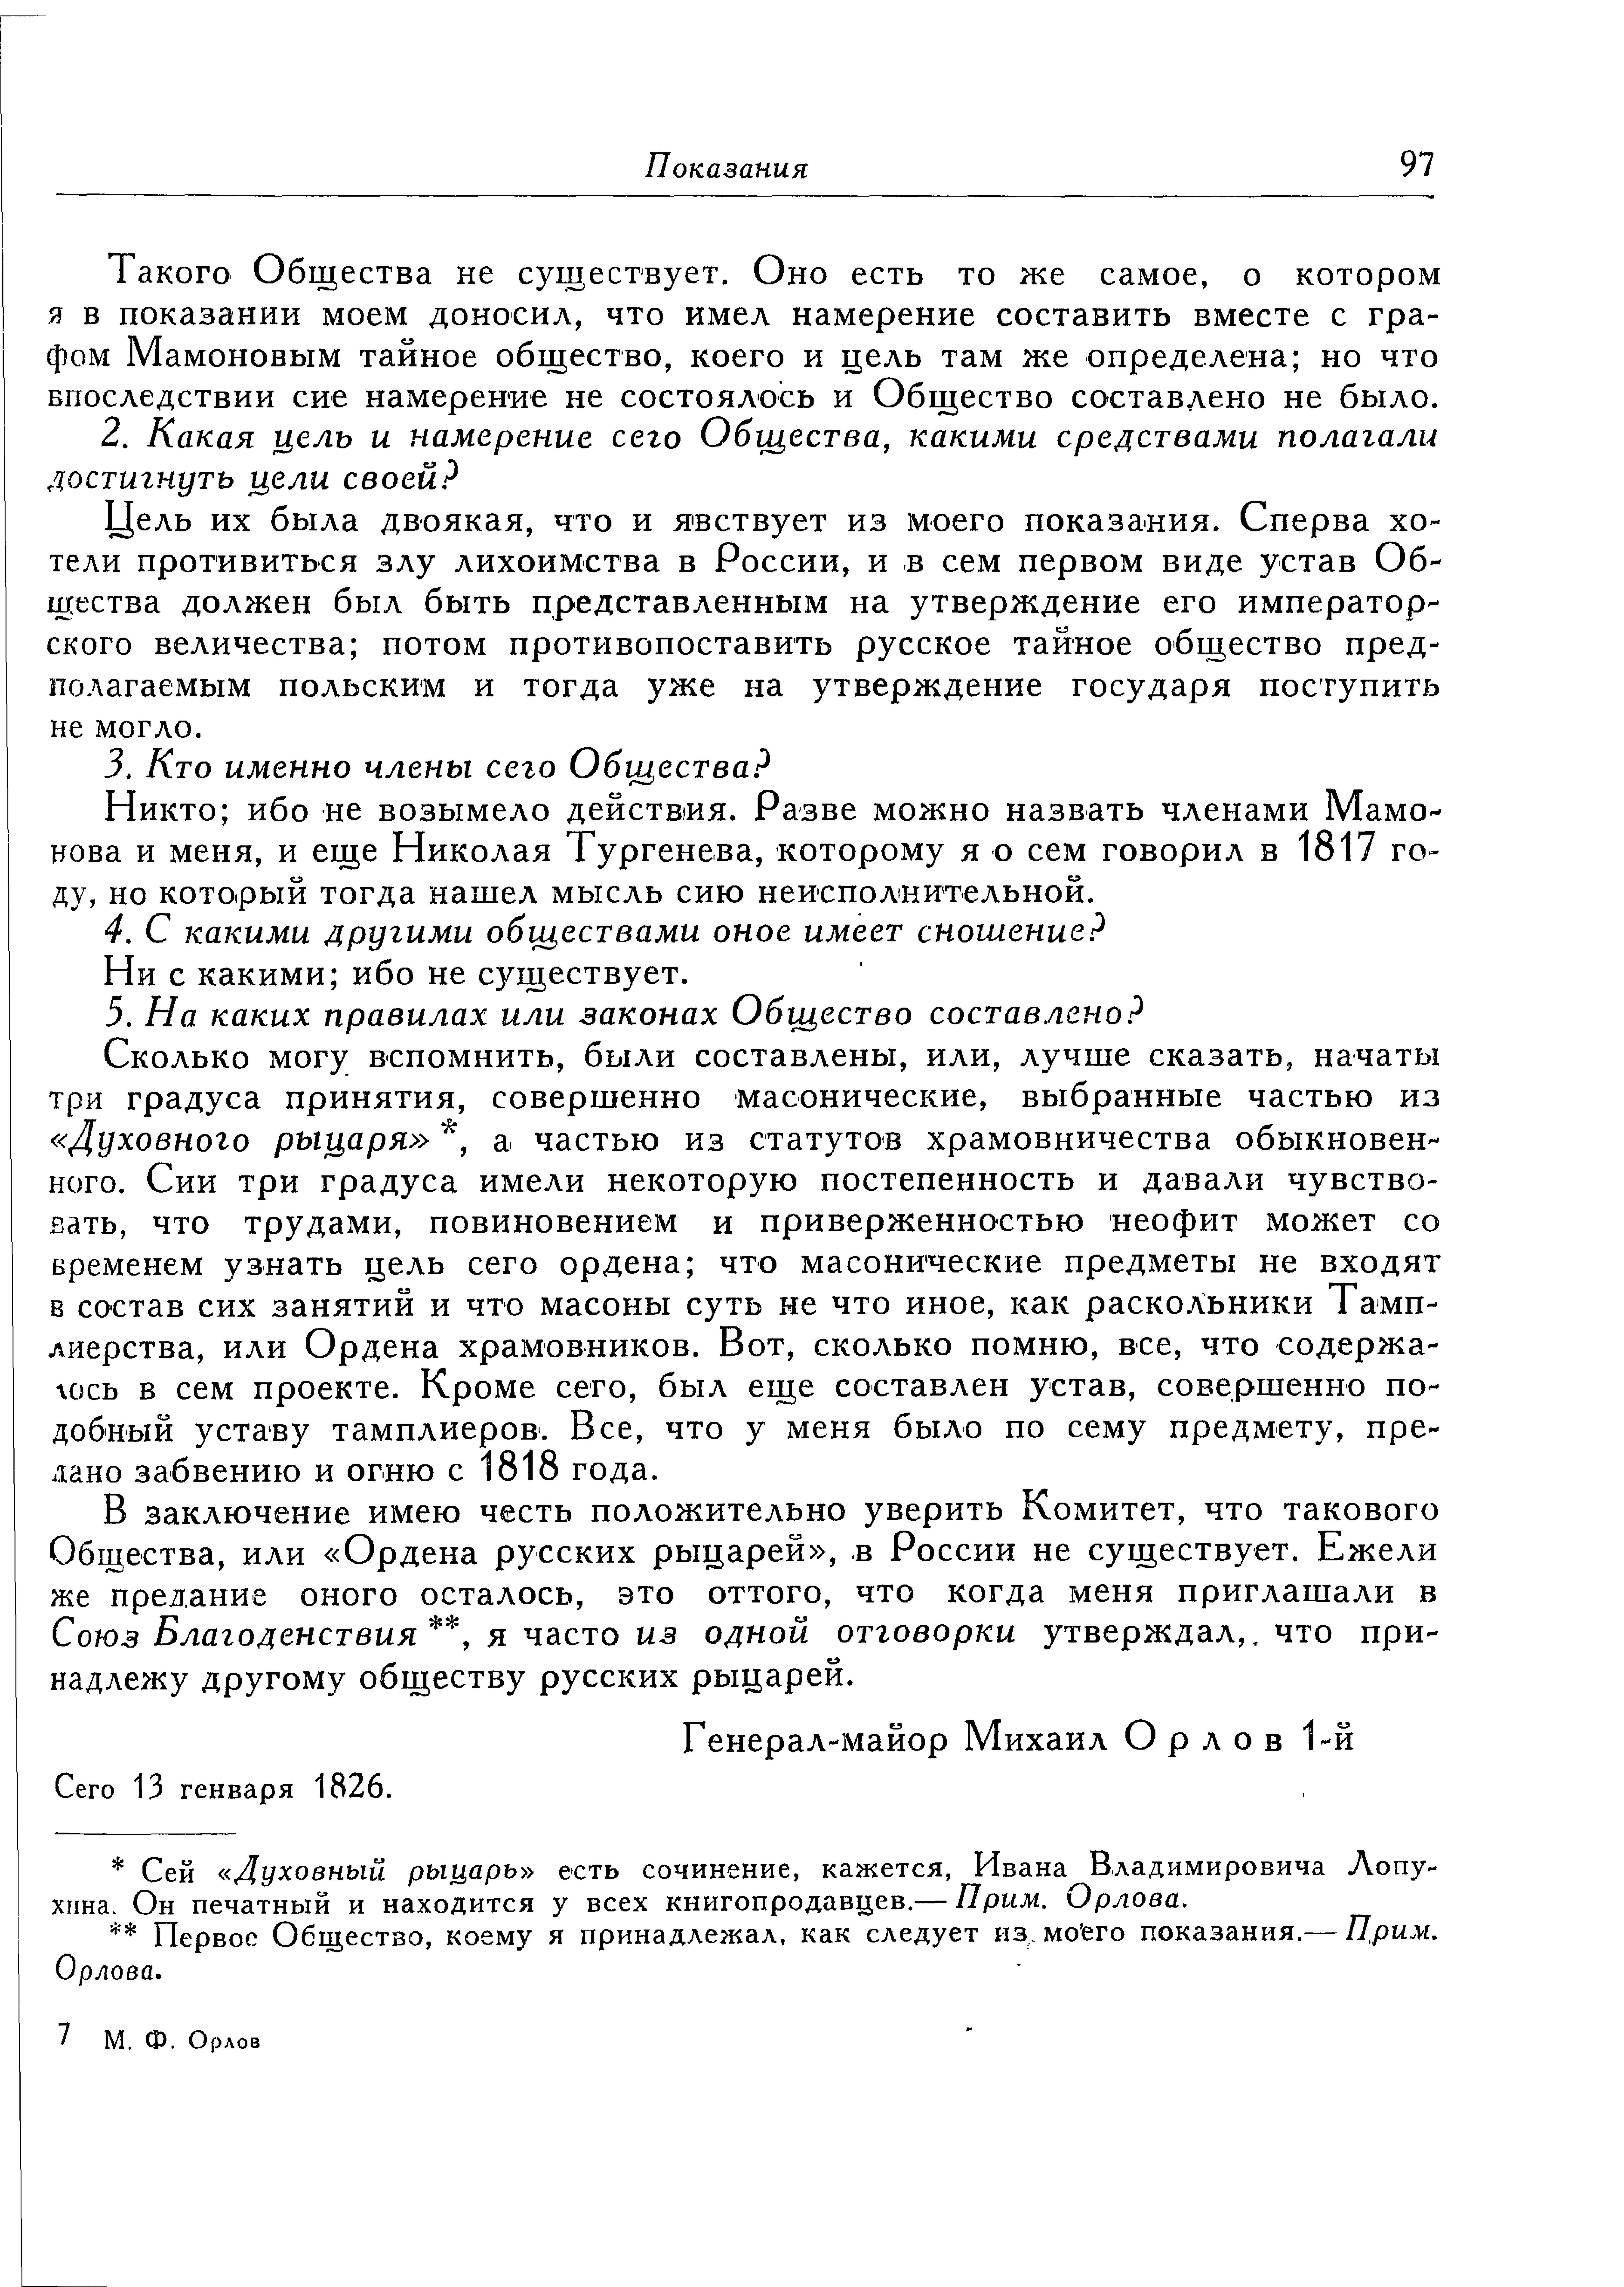 http://forumupload.ru/uploads/0019/93/b0/4/150205.png